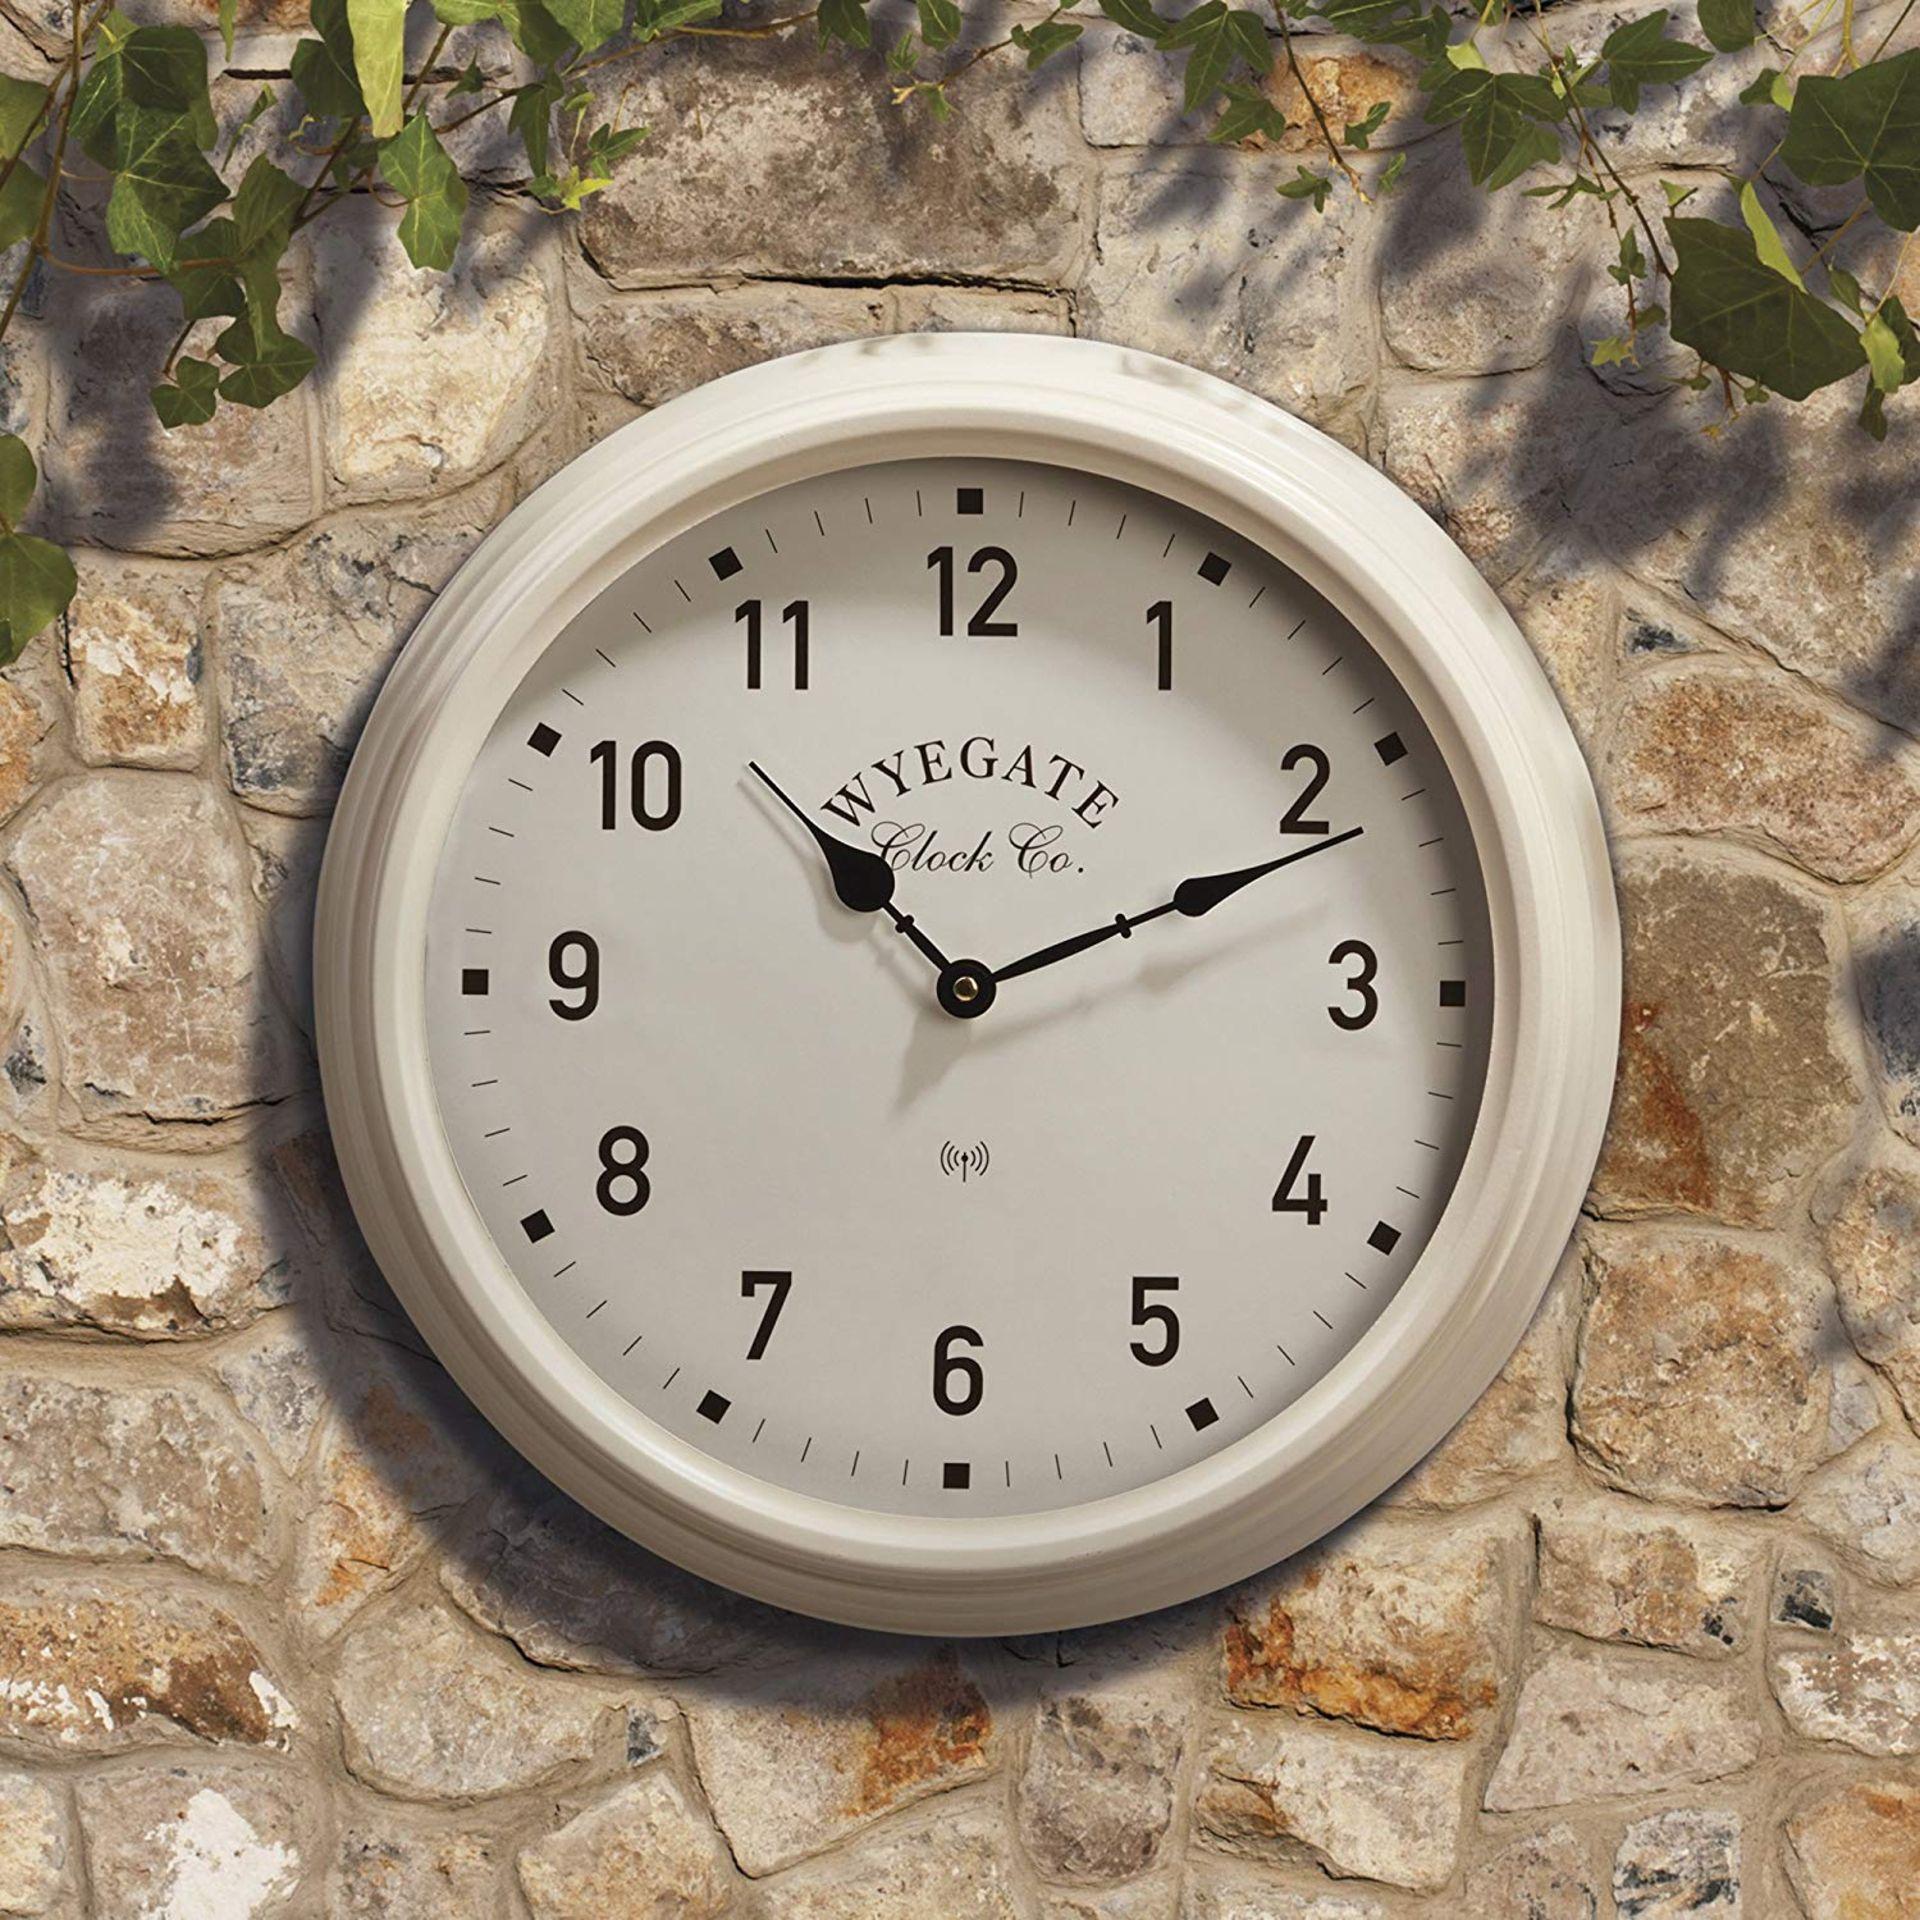 Lot 18048 - V Brand New Big Wyegate Garden/Indoor Clock (Radio Controlled) - 39cm - Cream - RRP £24.99 -